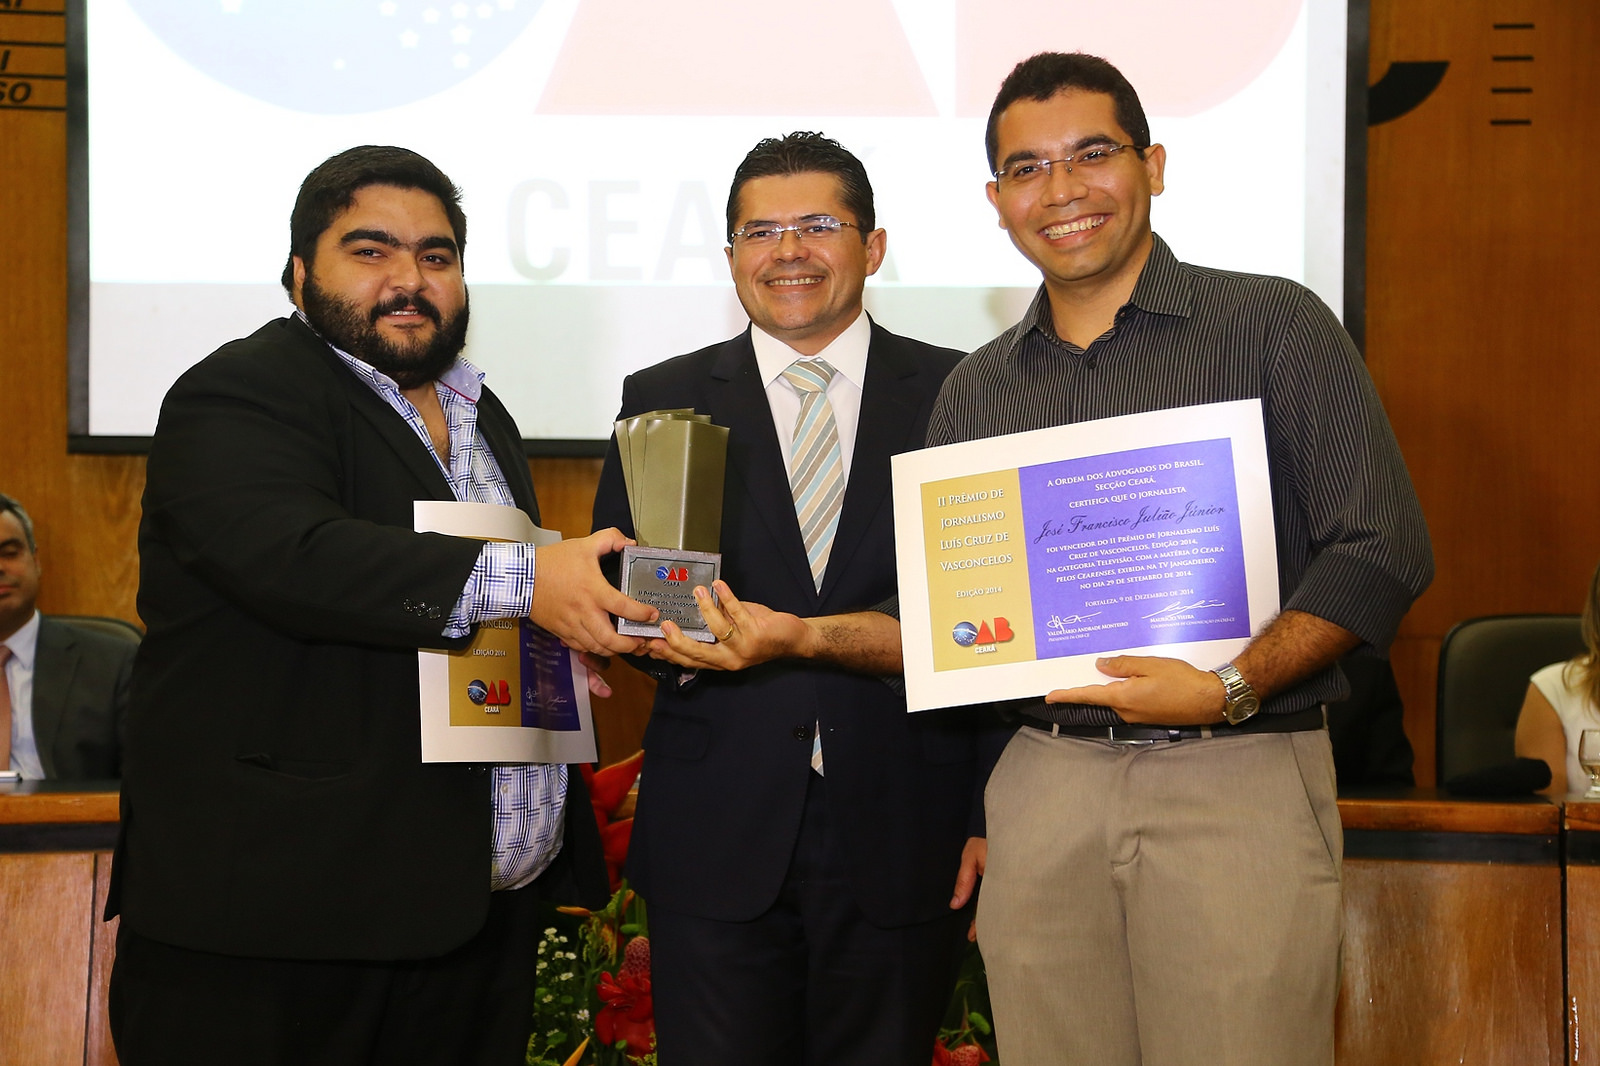 II Prêmio de Jornalismo Luís Cruz de Vasconcelos